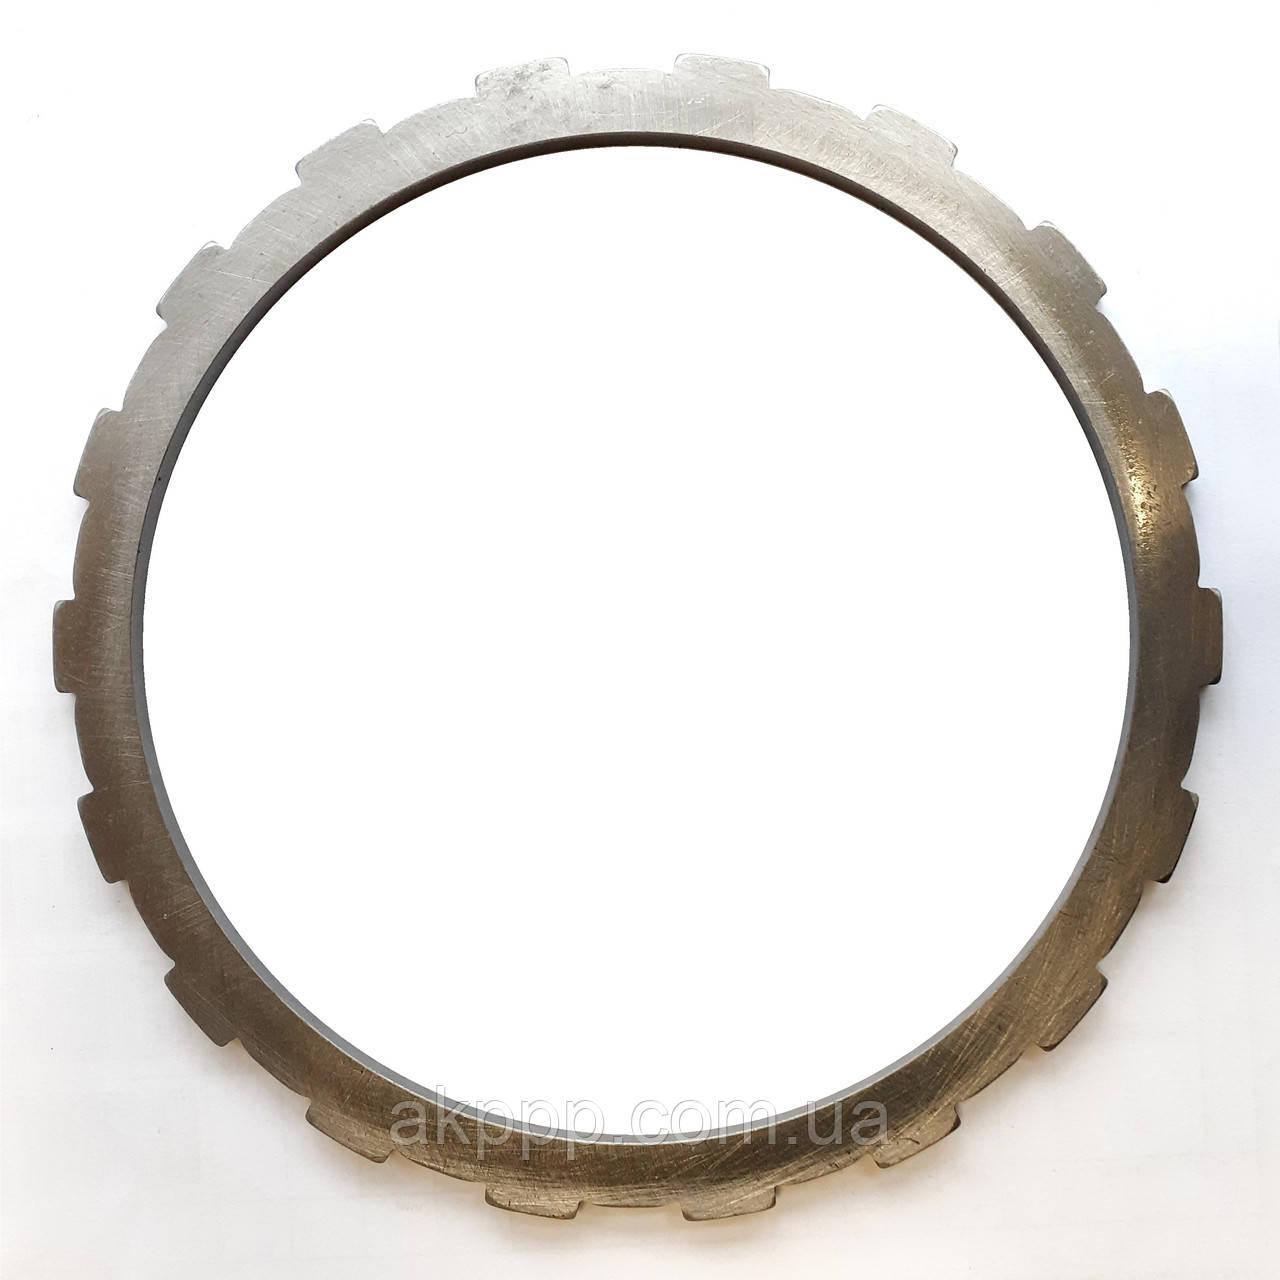 Упорный диск B1 АКПП R5RE05A, снято с новой коробки